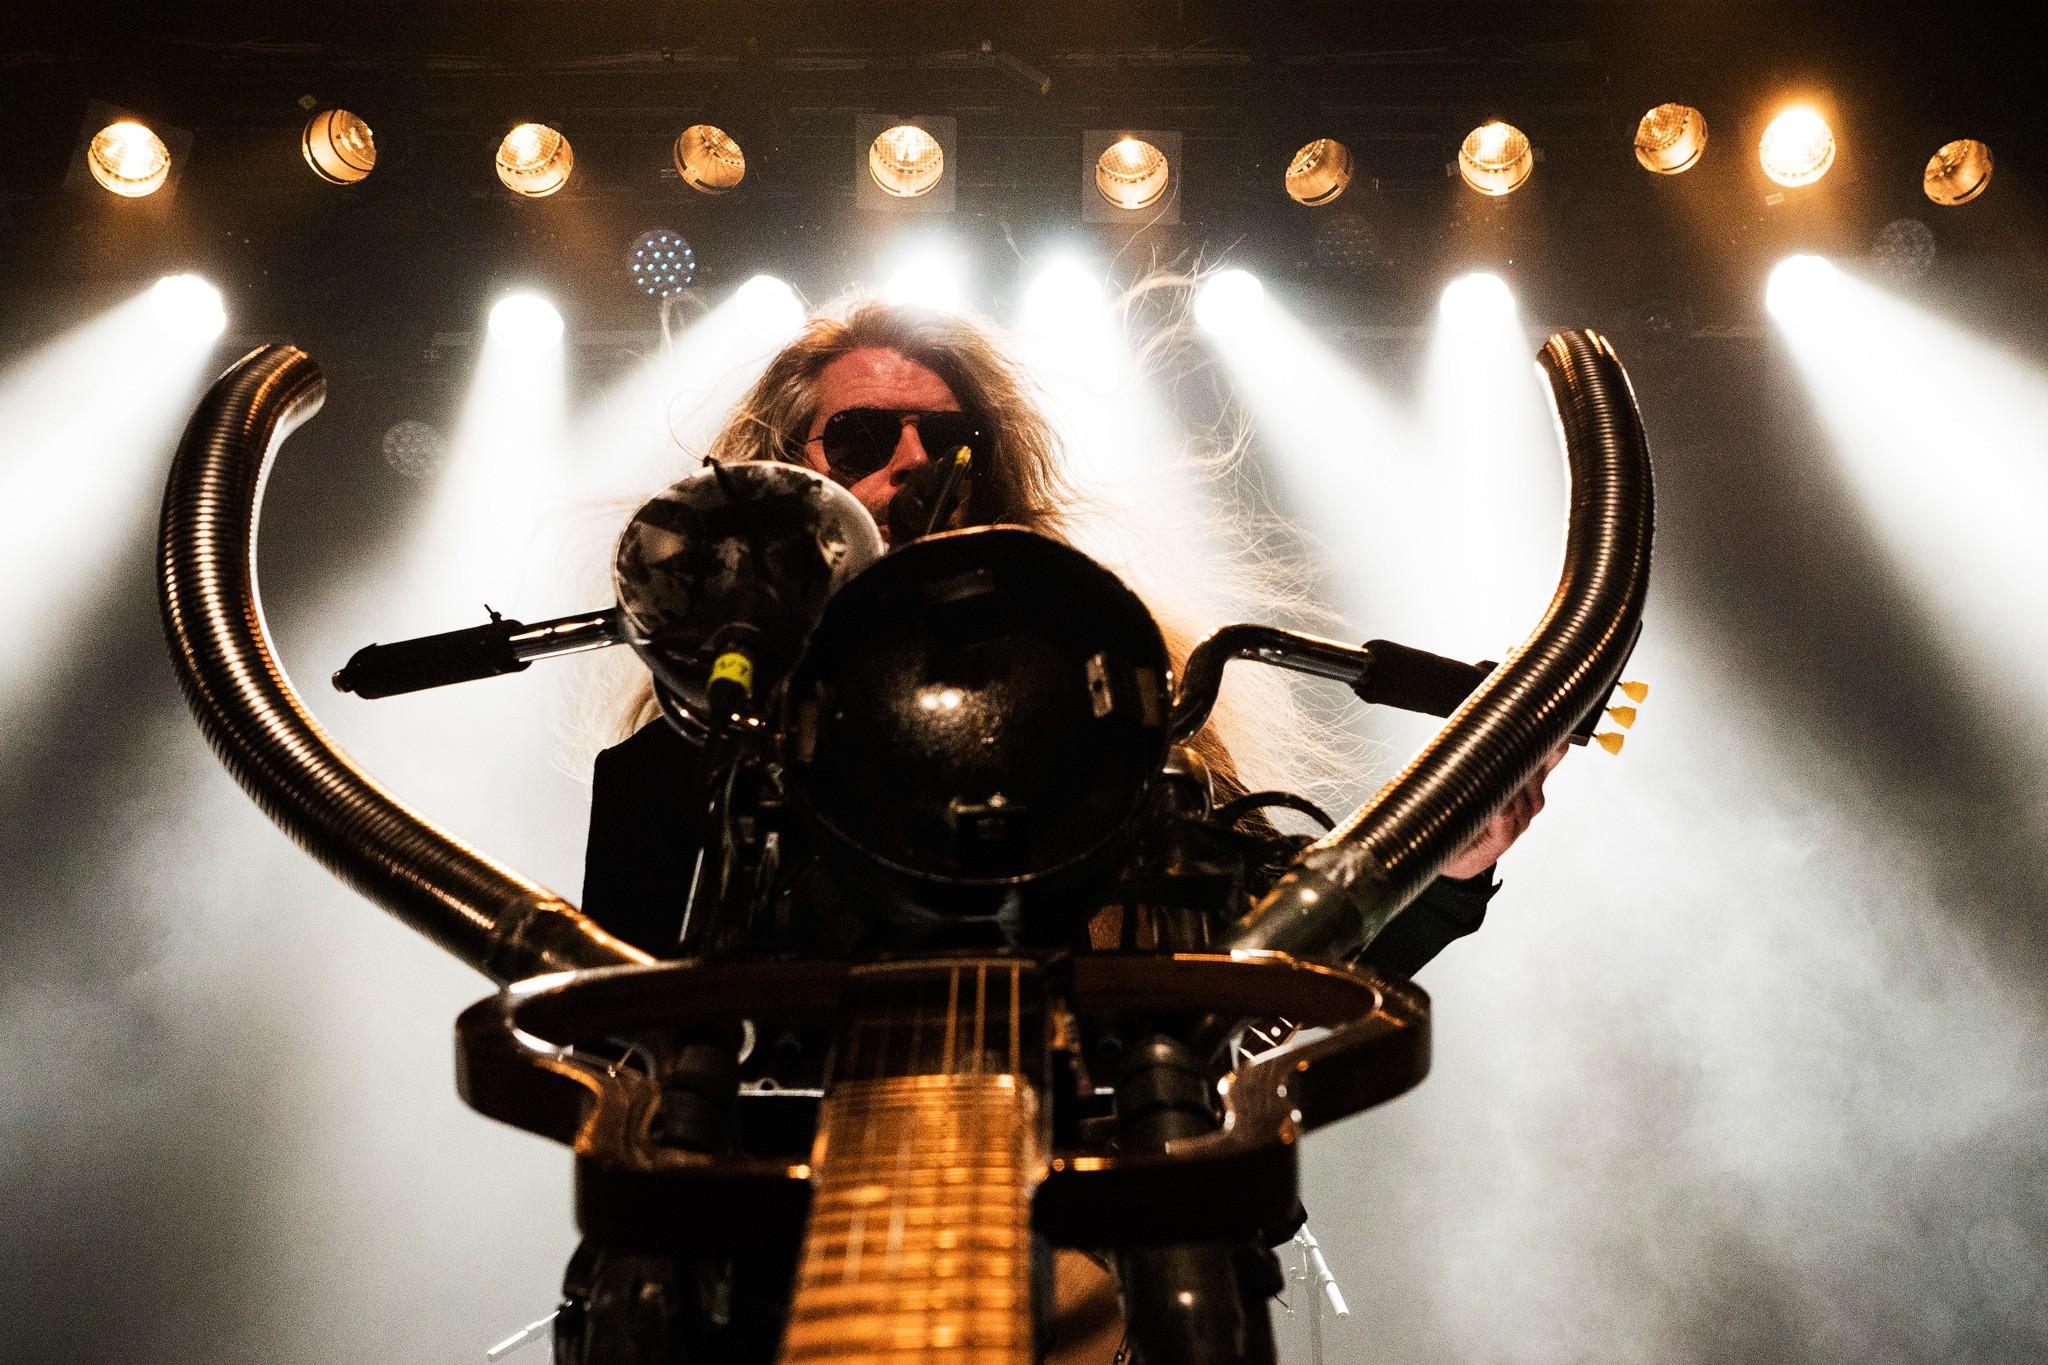 Lars Lønning, Black Debbath